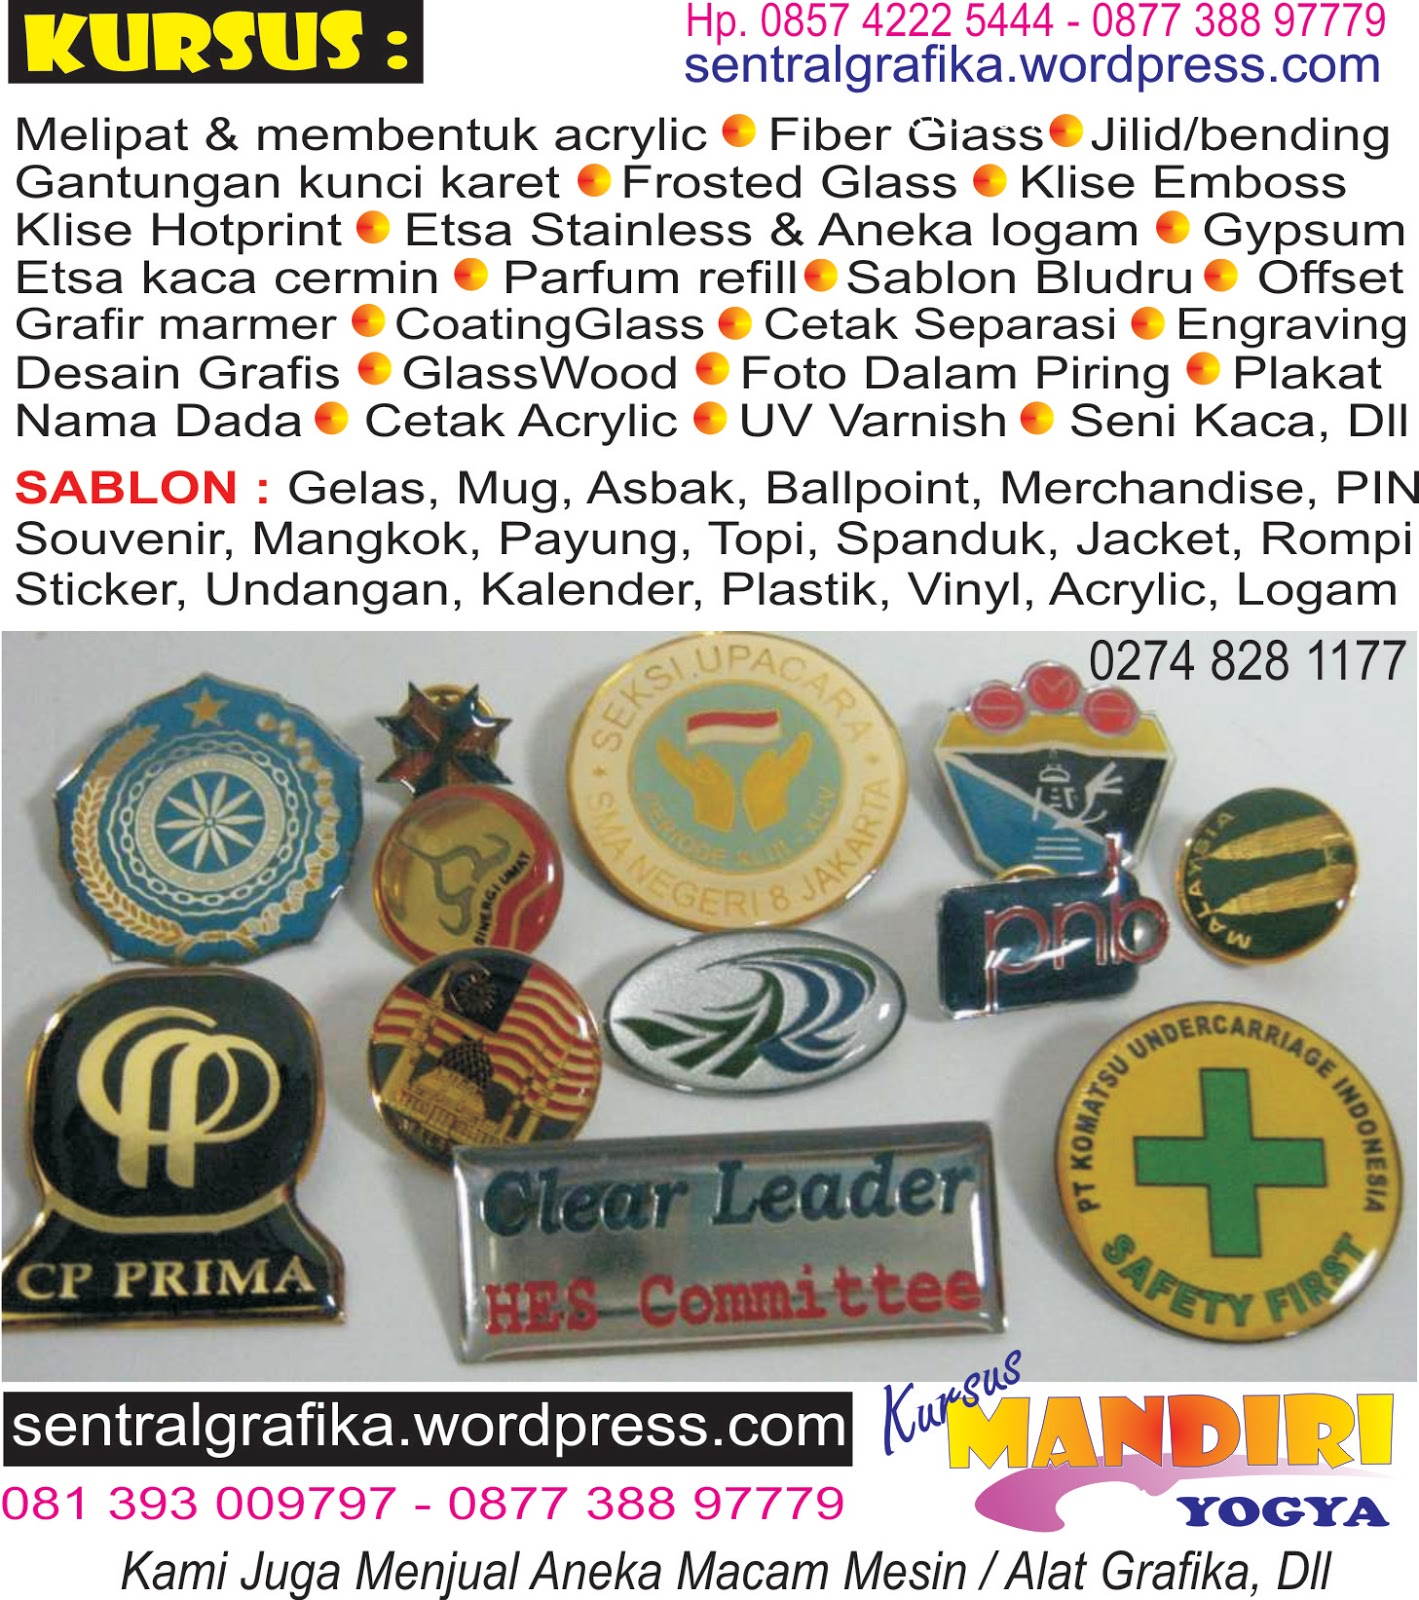 Cover Letter Examples Tamu: Fiberglass, Melipat Dan Membentuk Acrylic, Gantungan Kunci